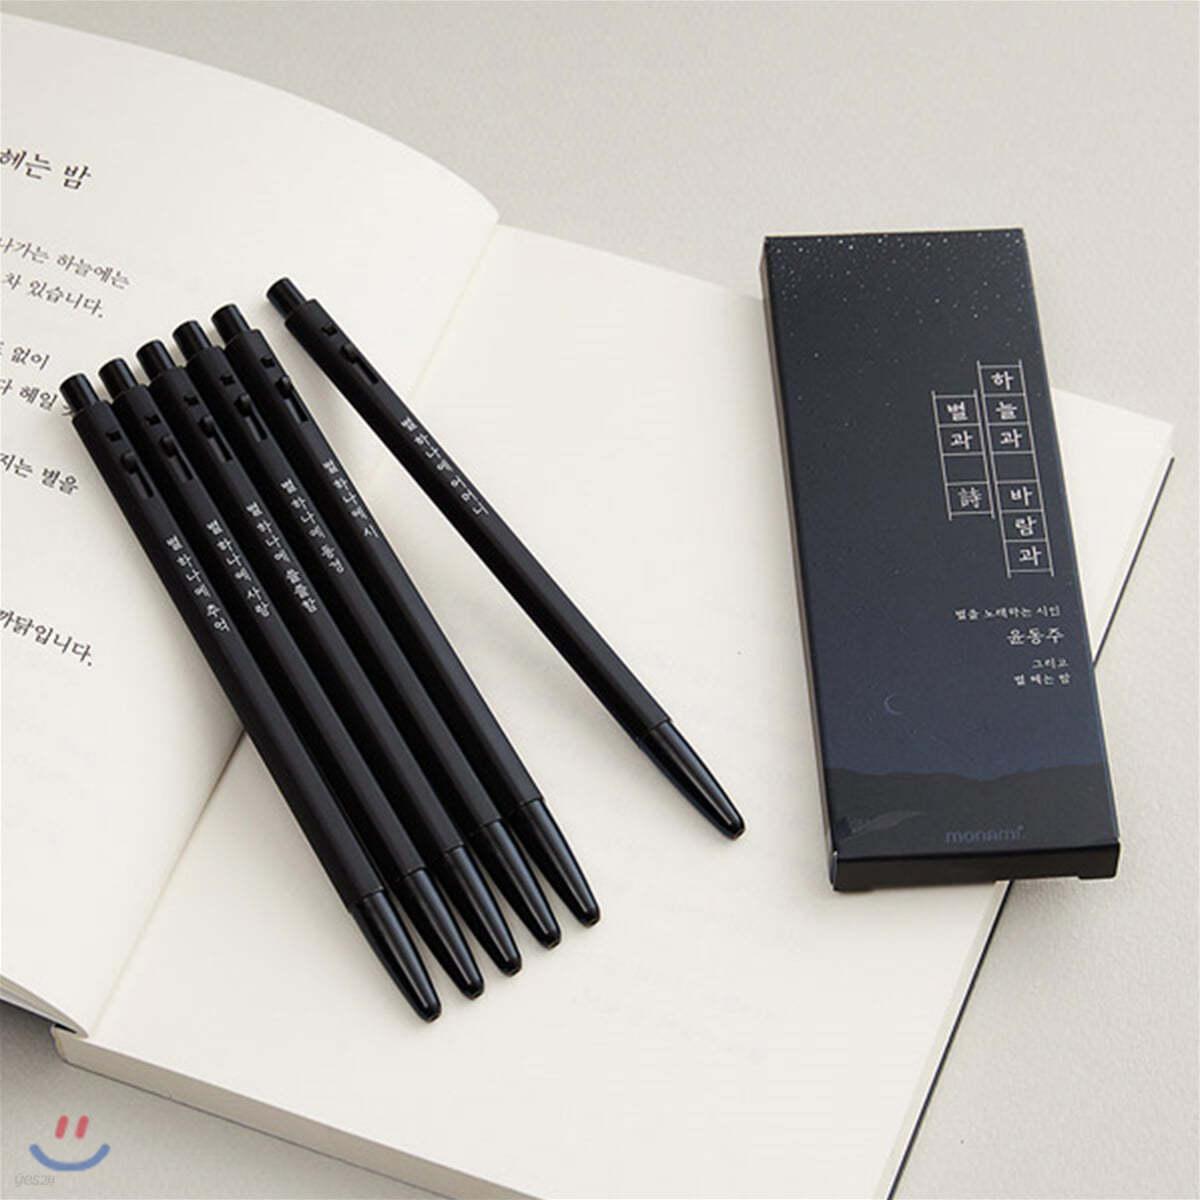 [YES24단독판매] 윤동주 별 헤는 밤 매트블랙 ver. 모나미 볼펜 6P세트